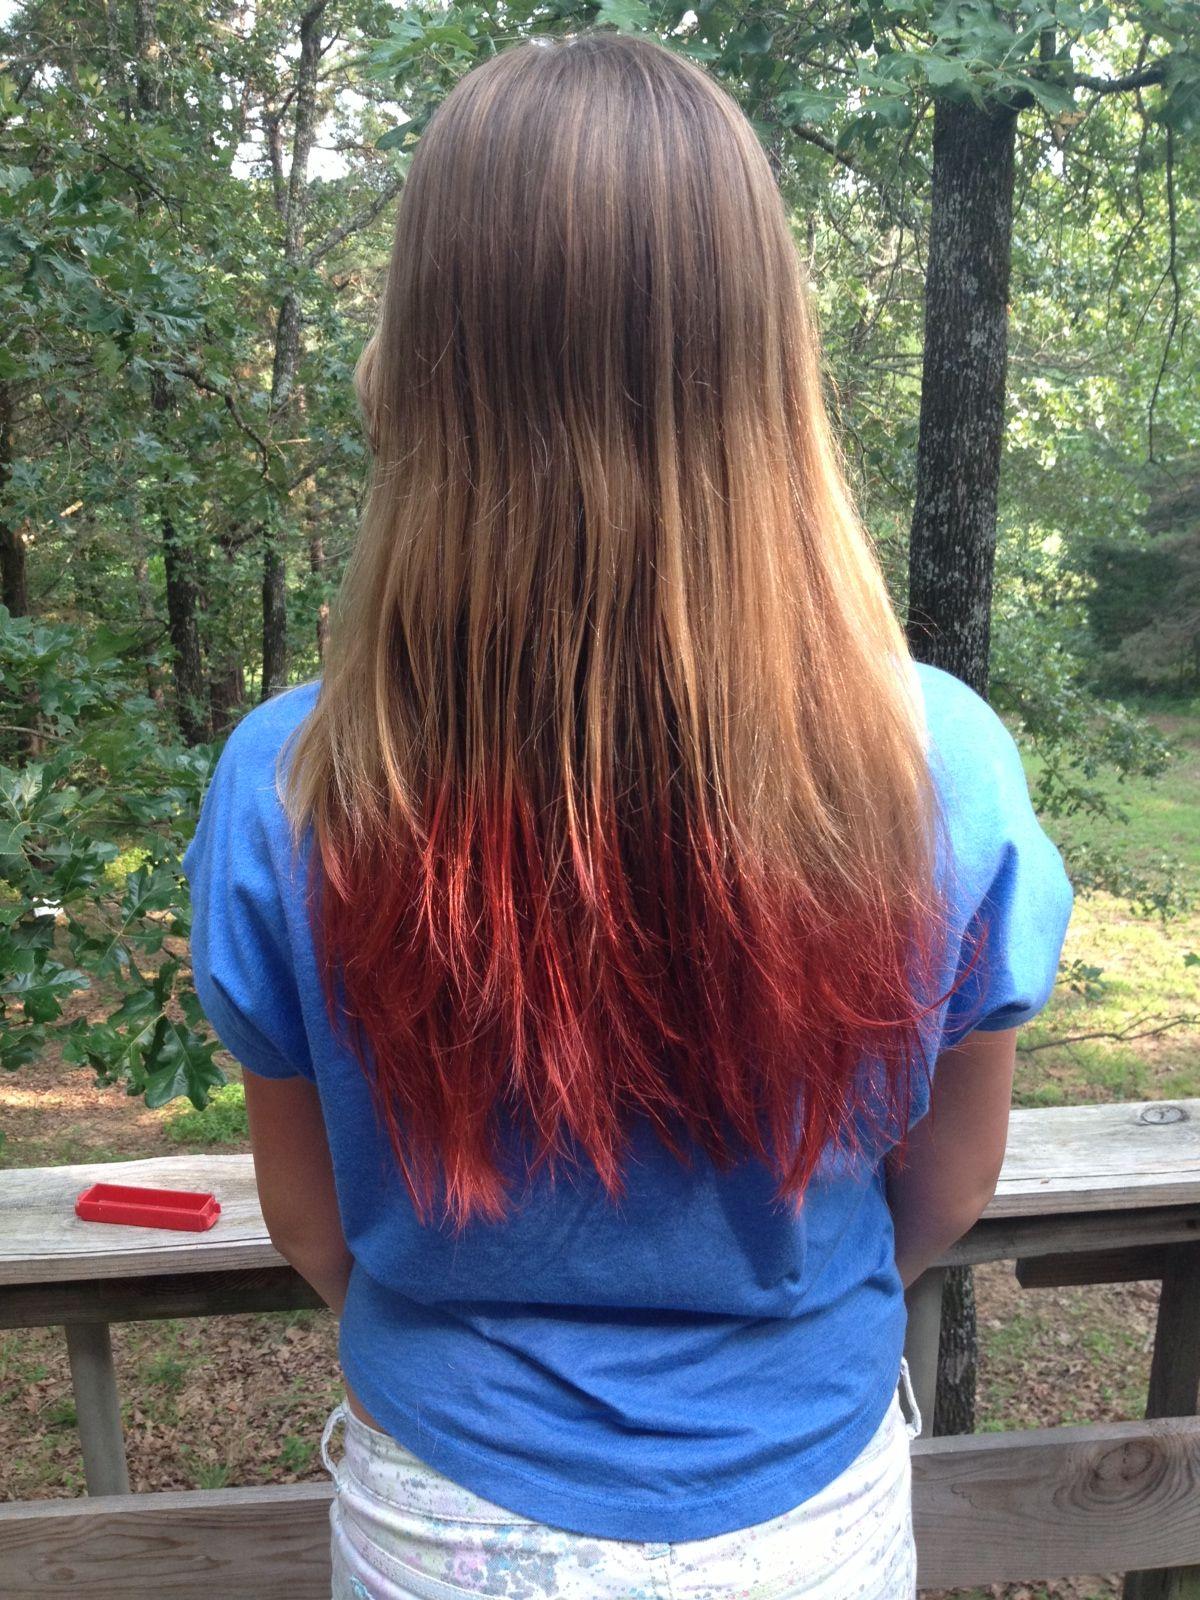 Dip Dyed Hair We Used Hawaiian Punch Packets Dip Dye Hair Hair Dyed Hair